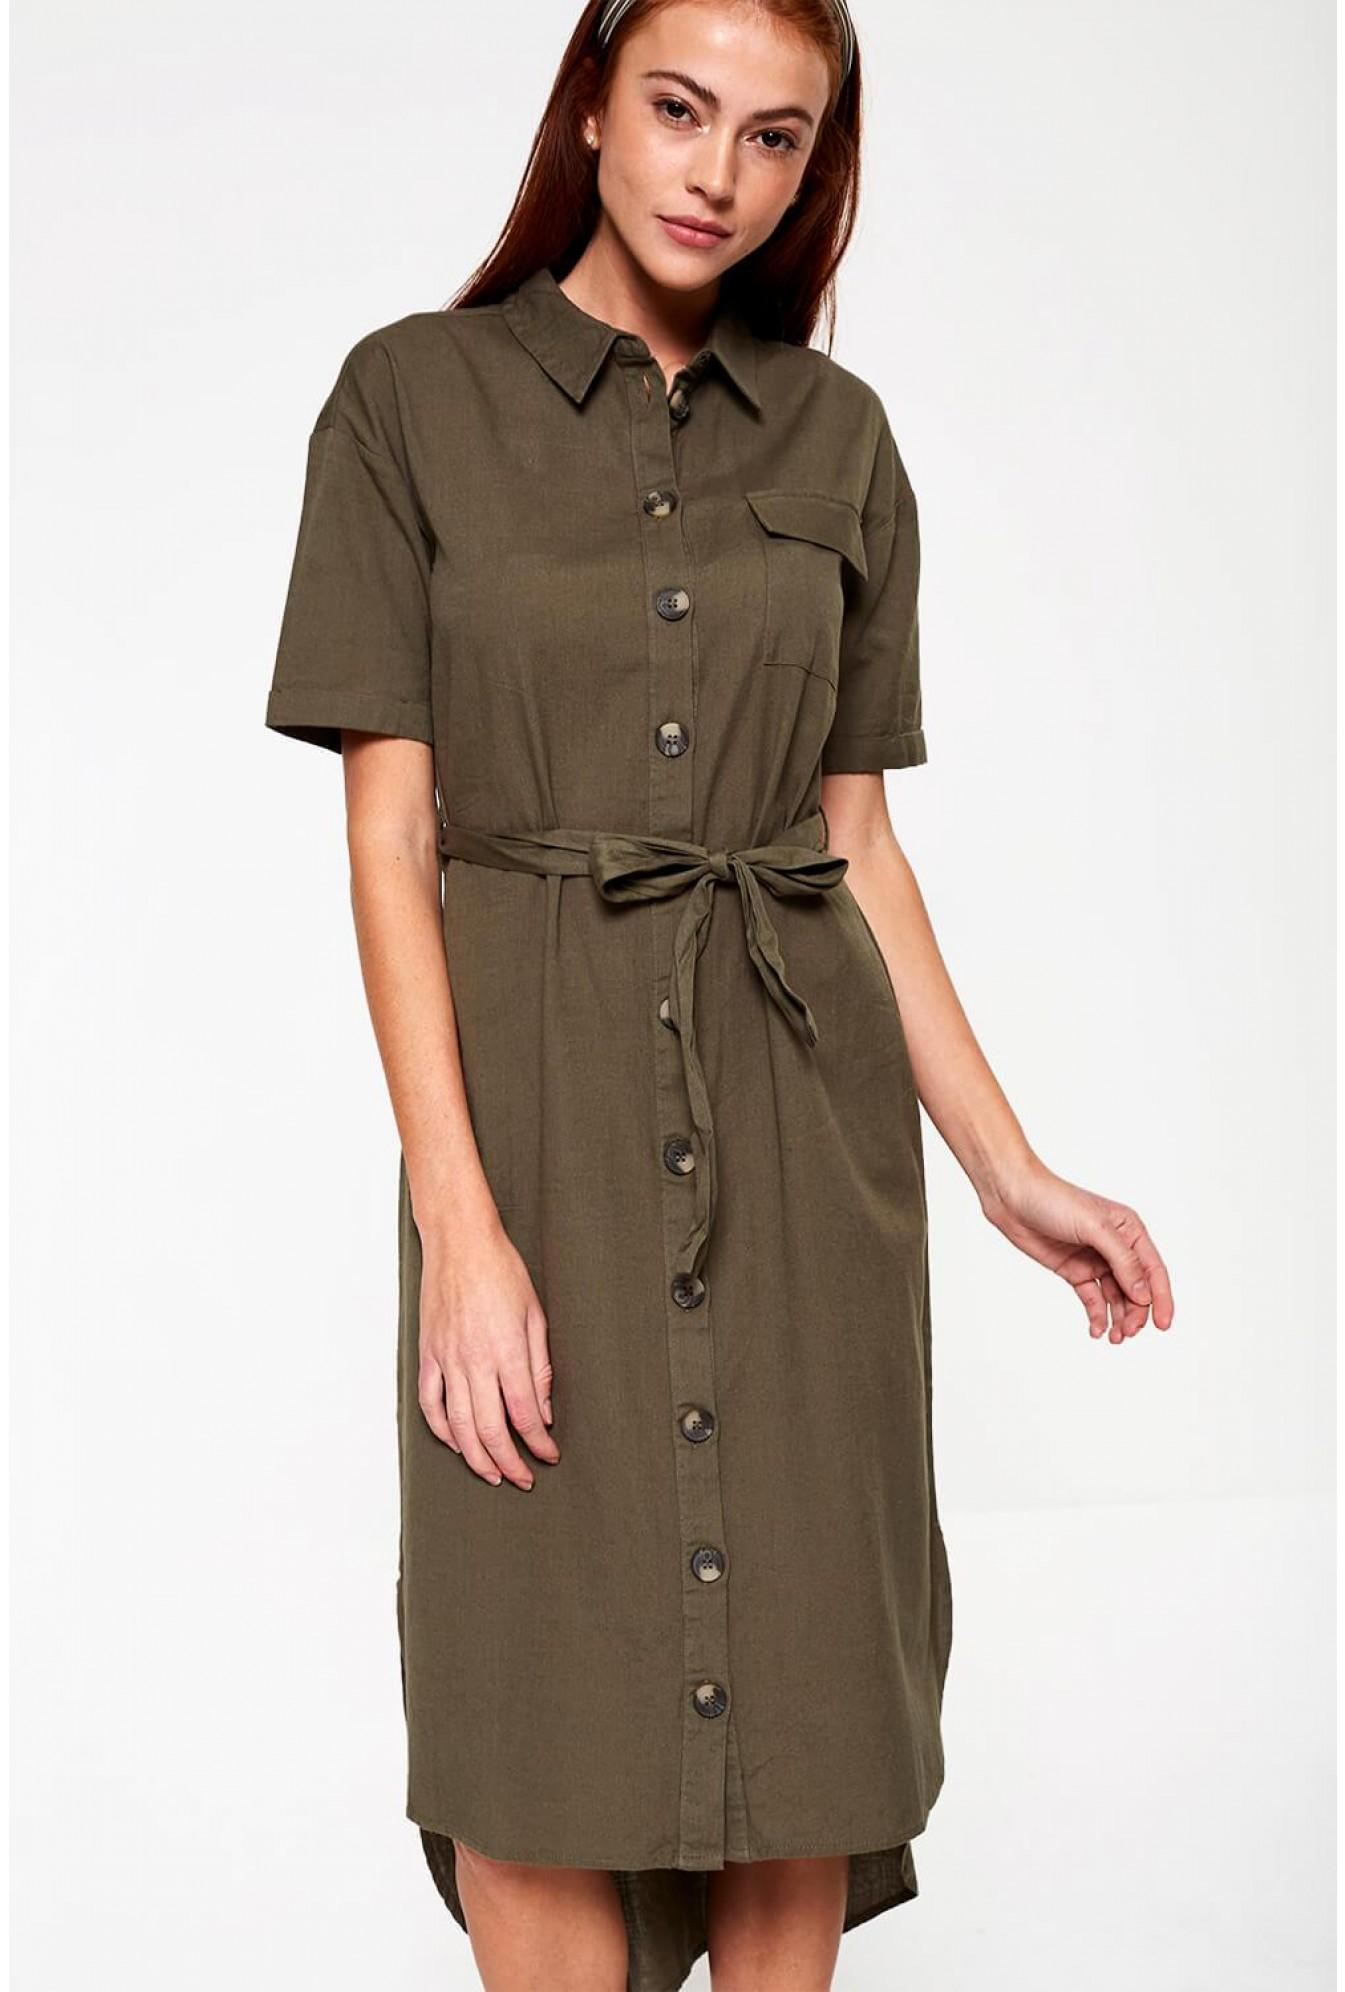 olive shirt dress